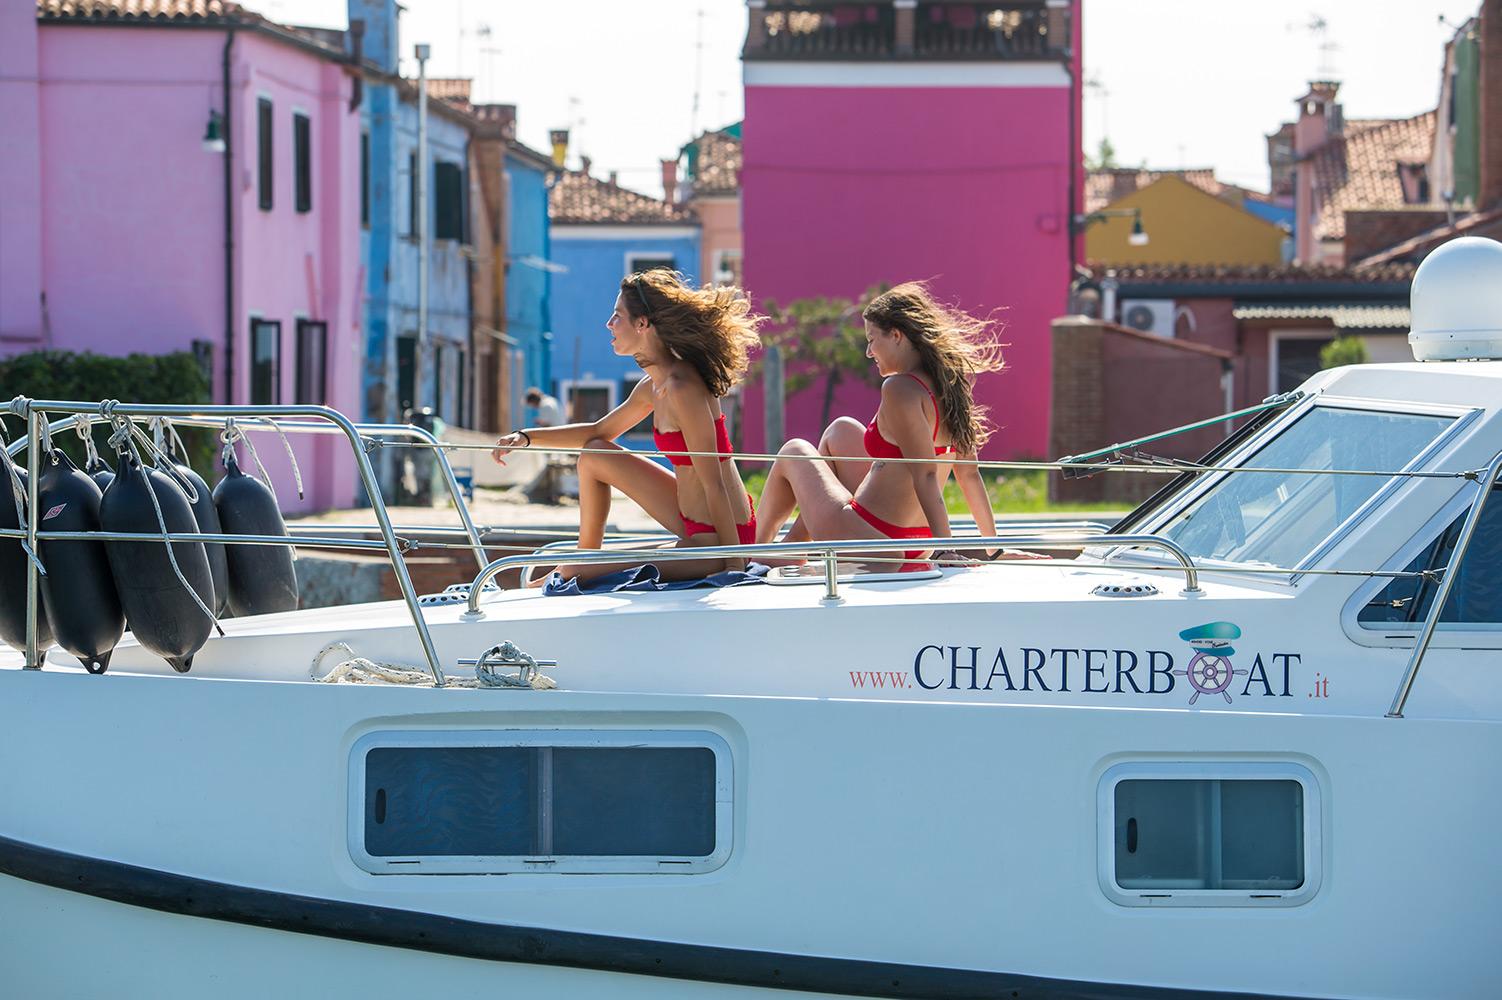 Ragazze in costume houseboat rendez vous fantasia charterboat murano venezia